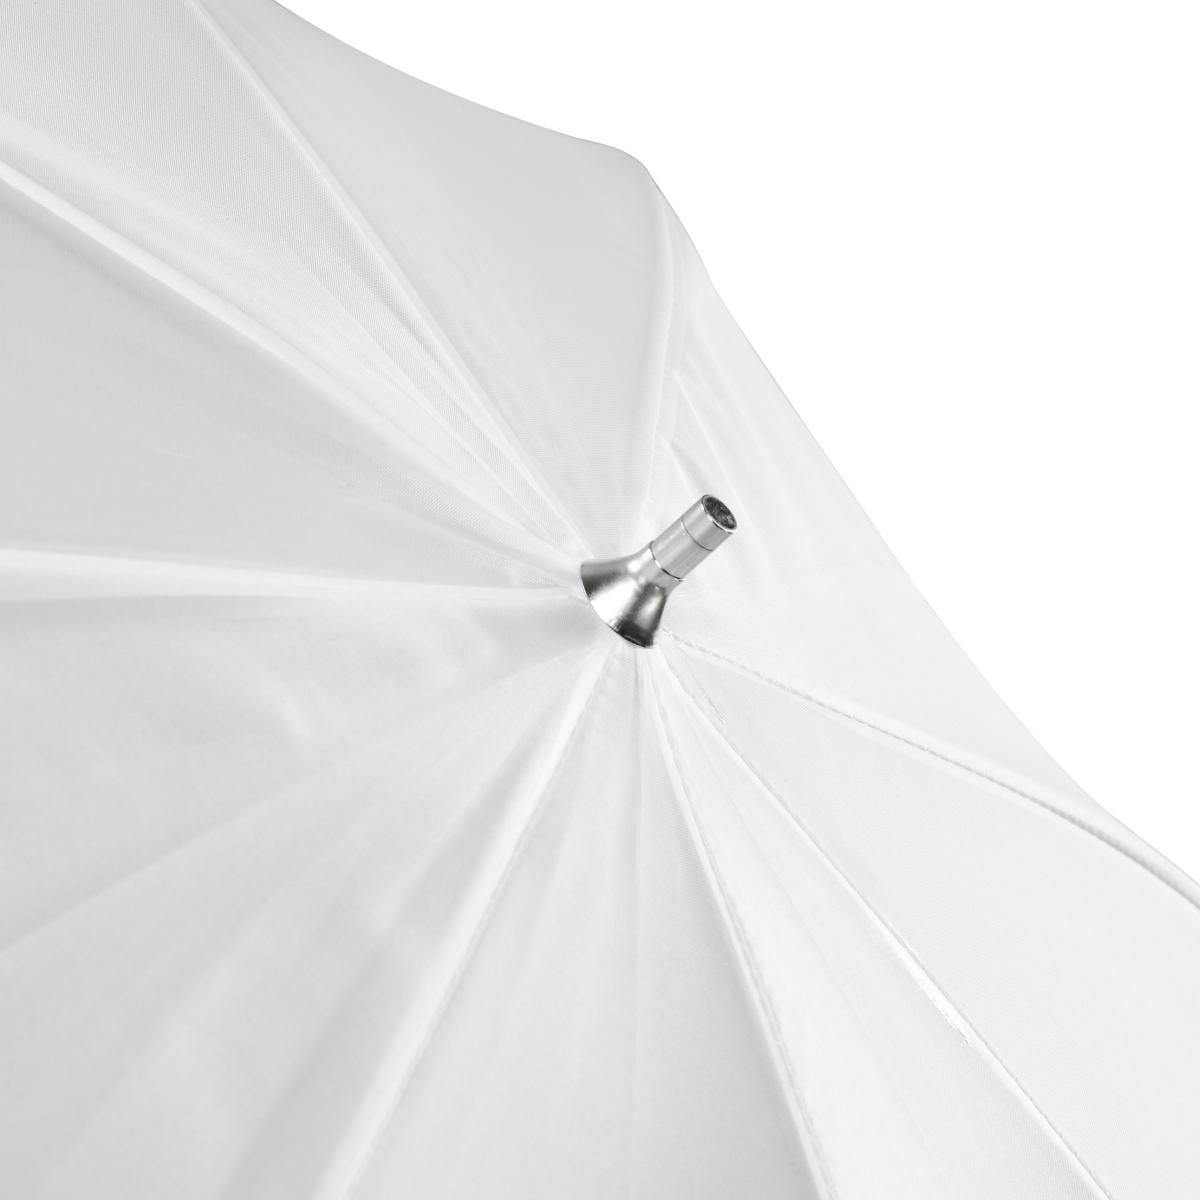 Walimex Pro Translucent Umbrella softbox 109 cm by Walimex Pro (Image #3)